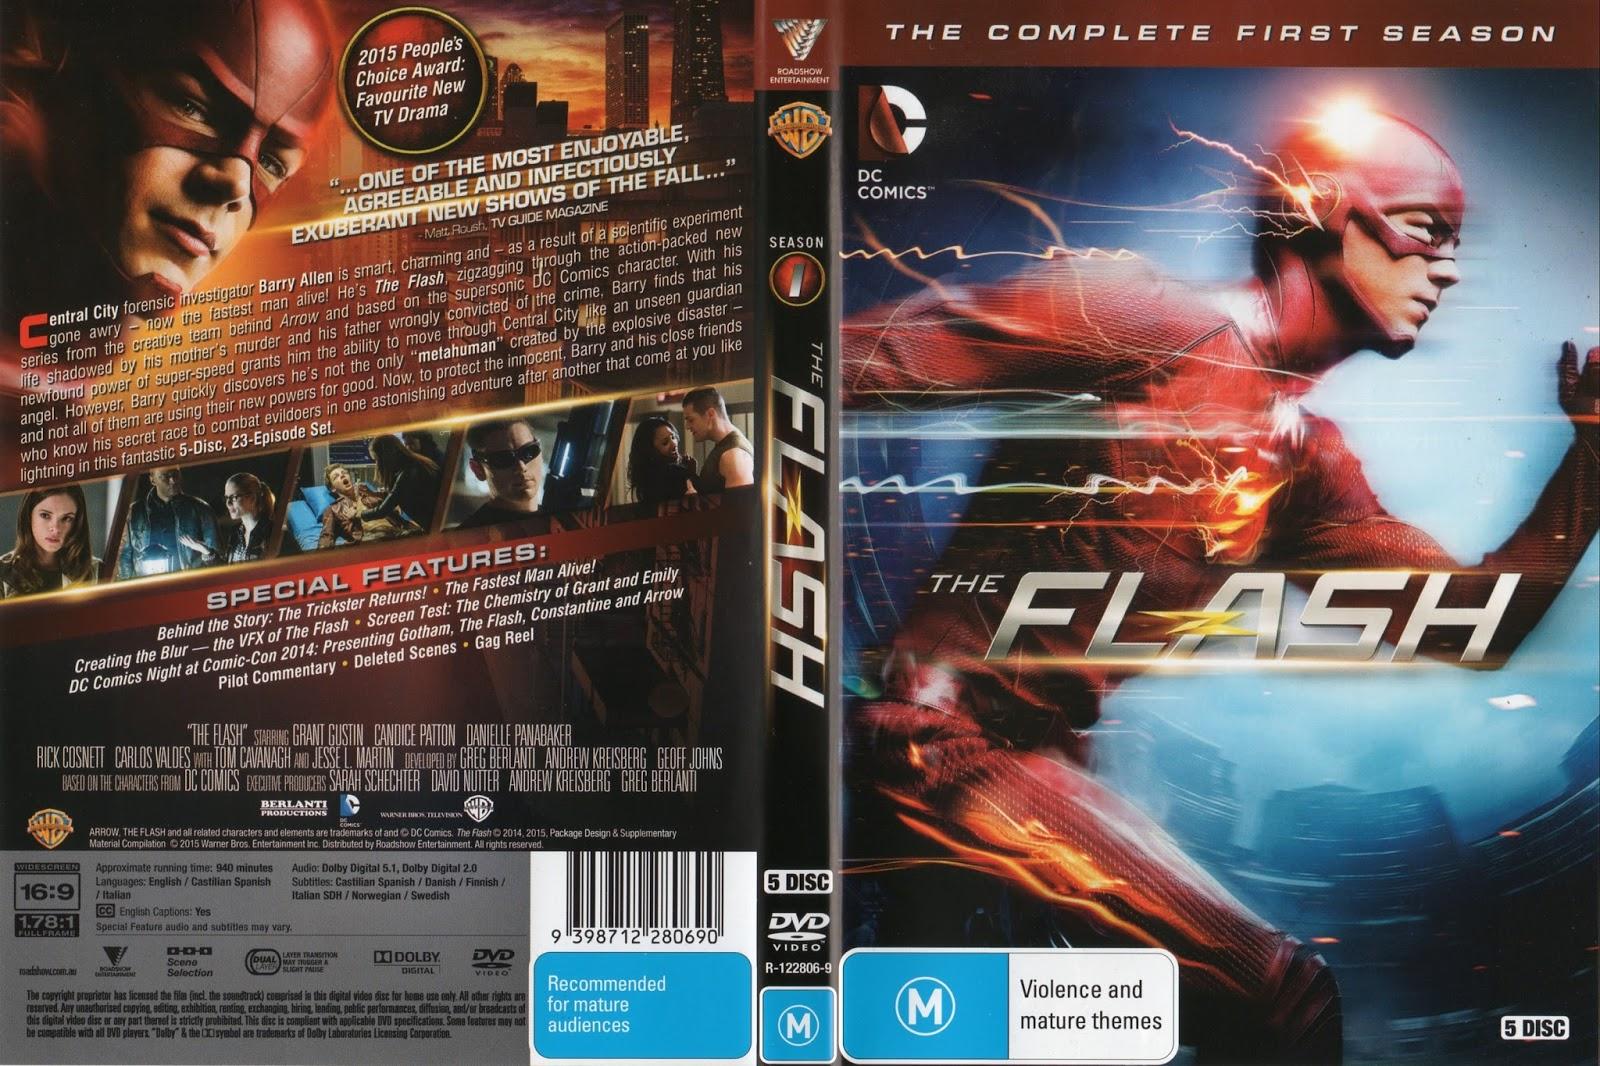 The Flash T01 - Official - English Version | Gigante das Capas